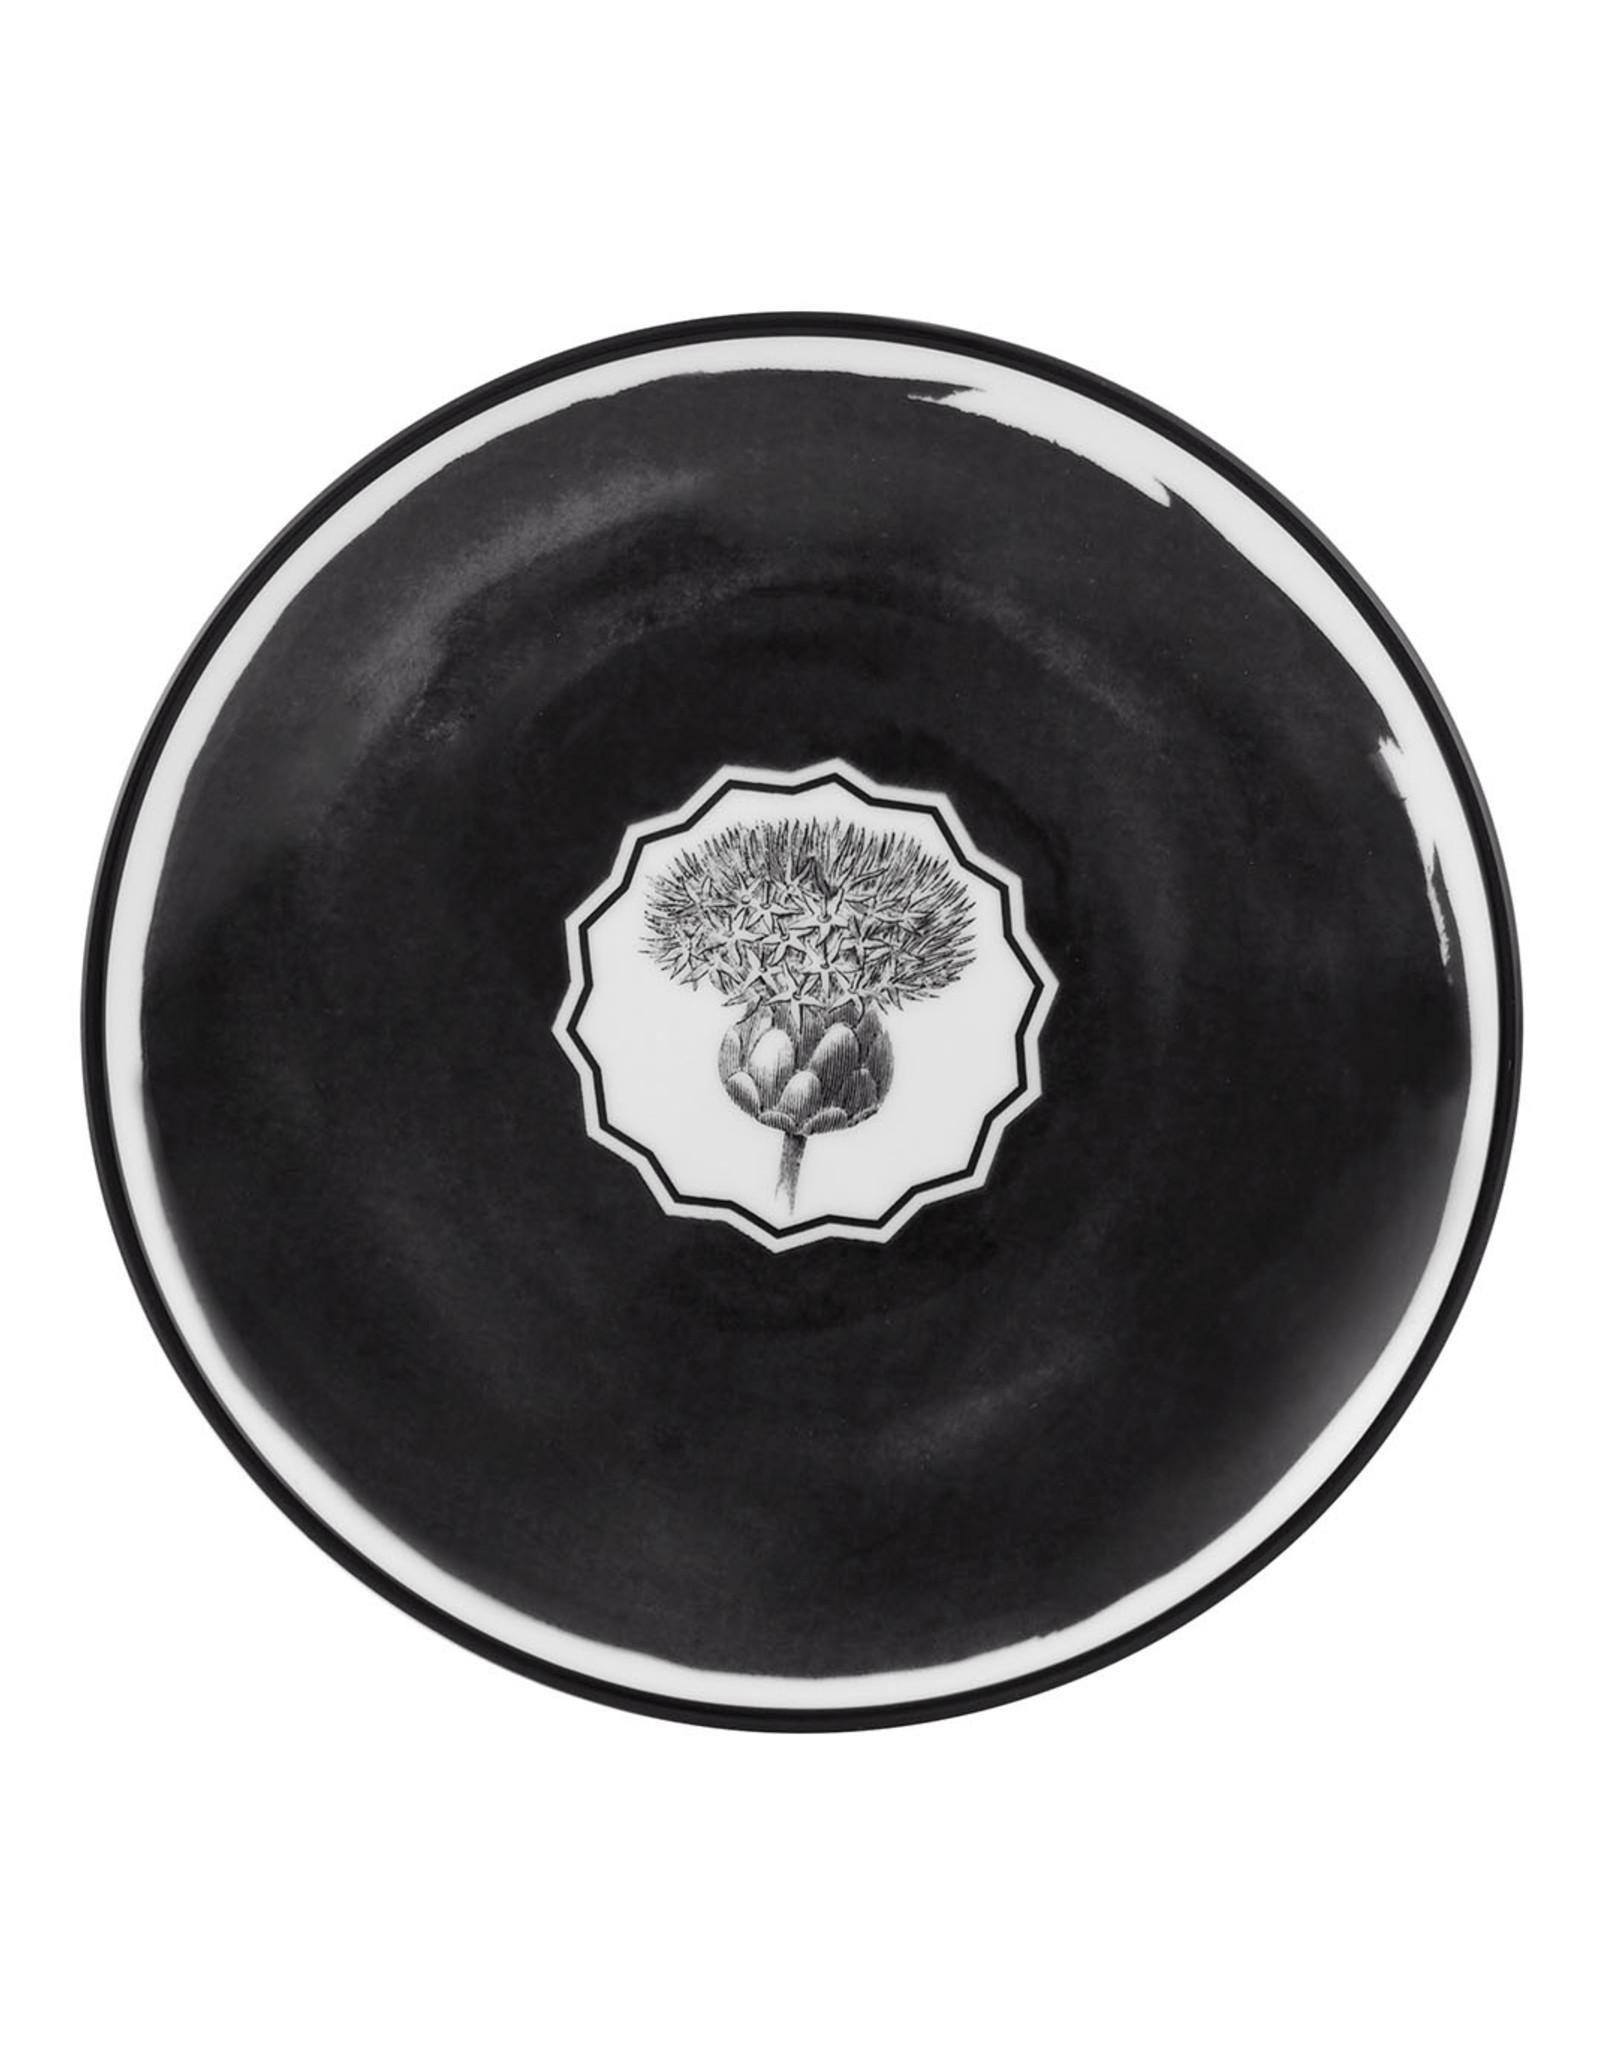 Vista Allegre Herbariae Porcelain Tableware